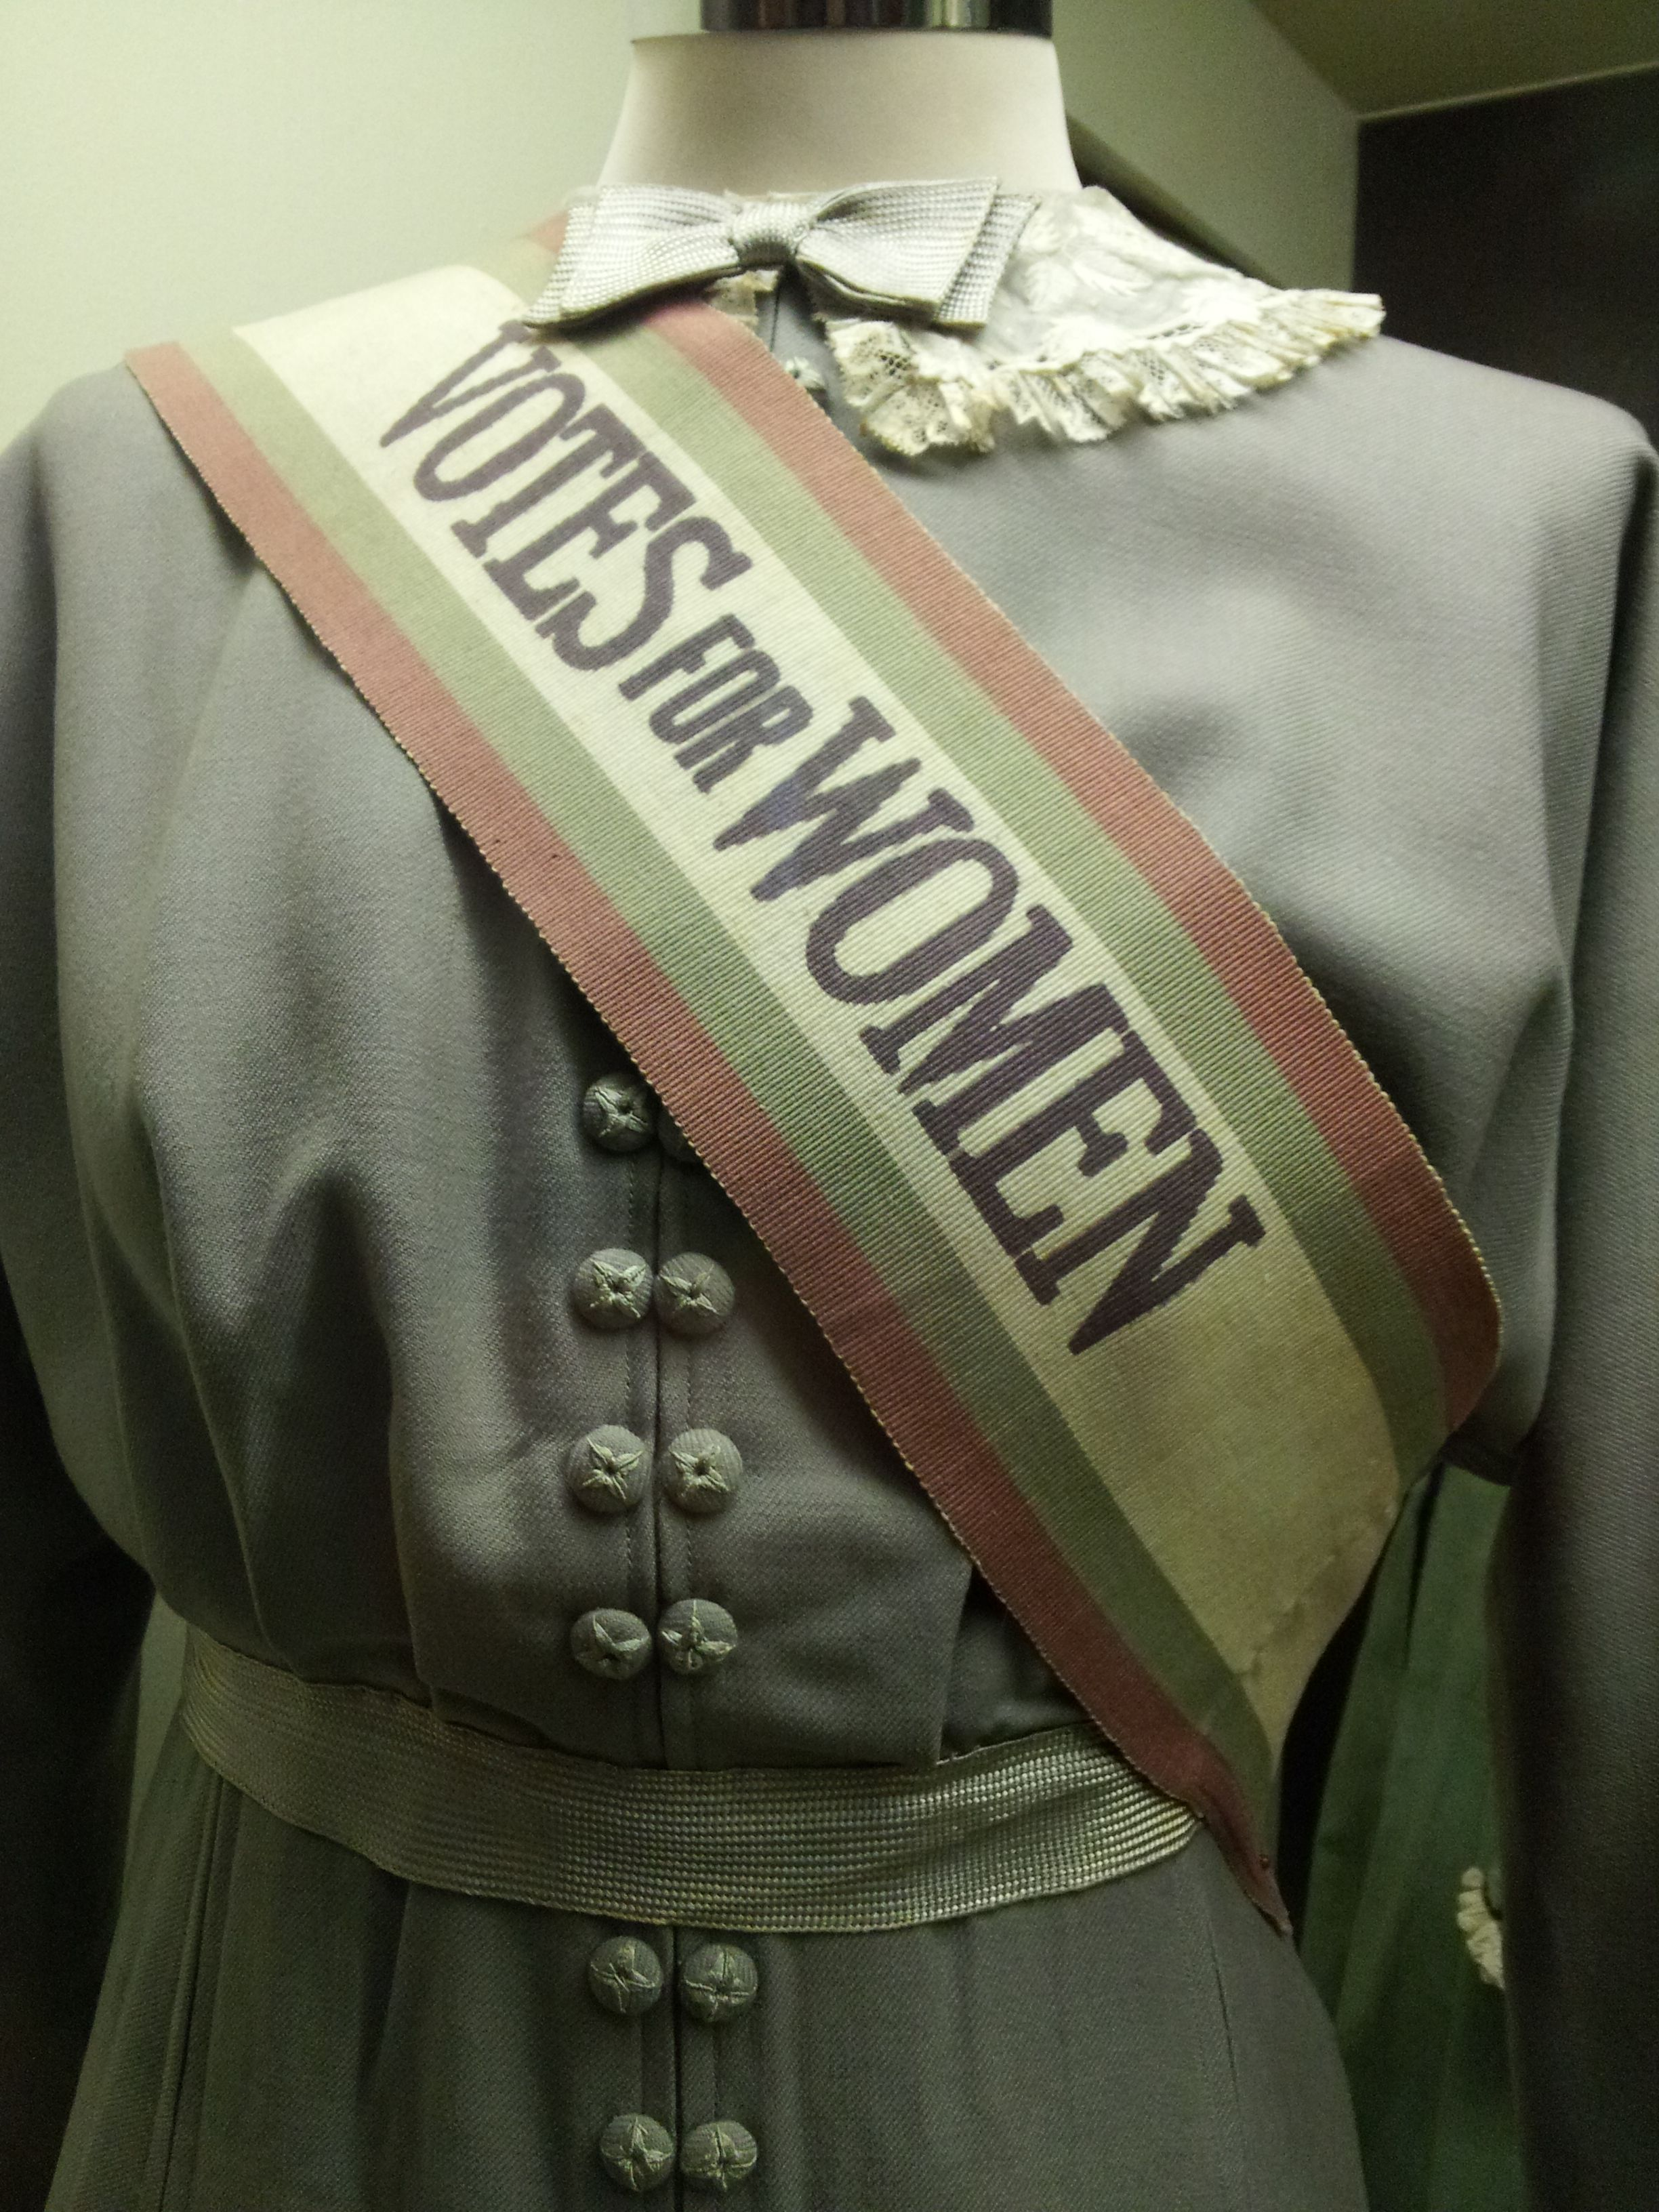 Inspiration Research Women Suffragette Suffragette Womens Rights [ 3264 x 2448 Pixel ]